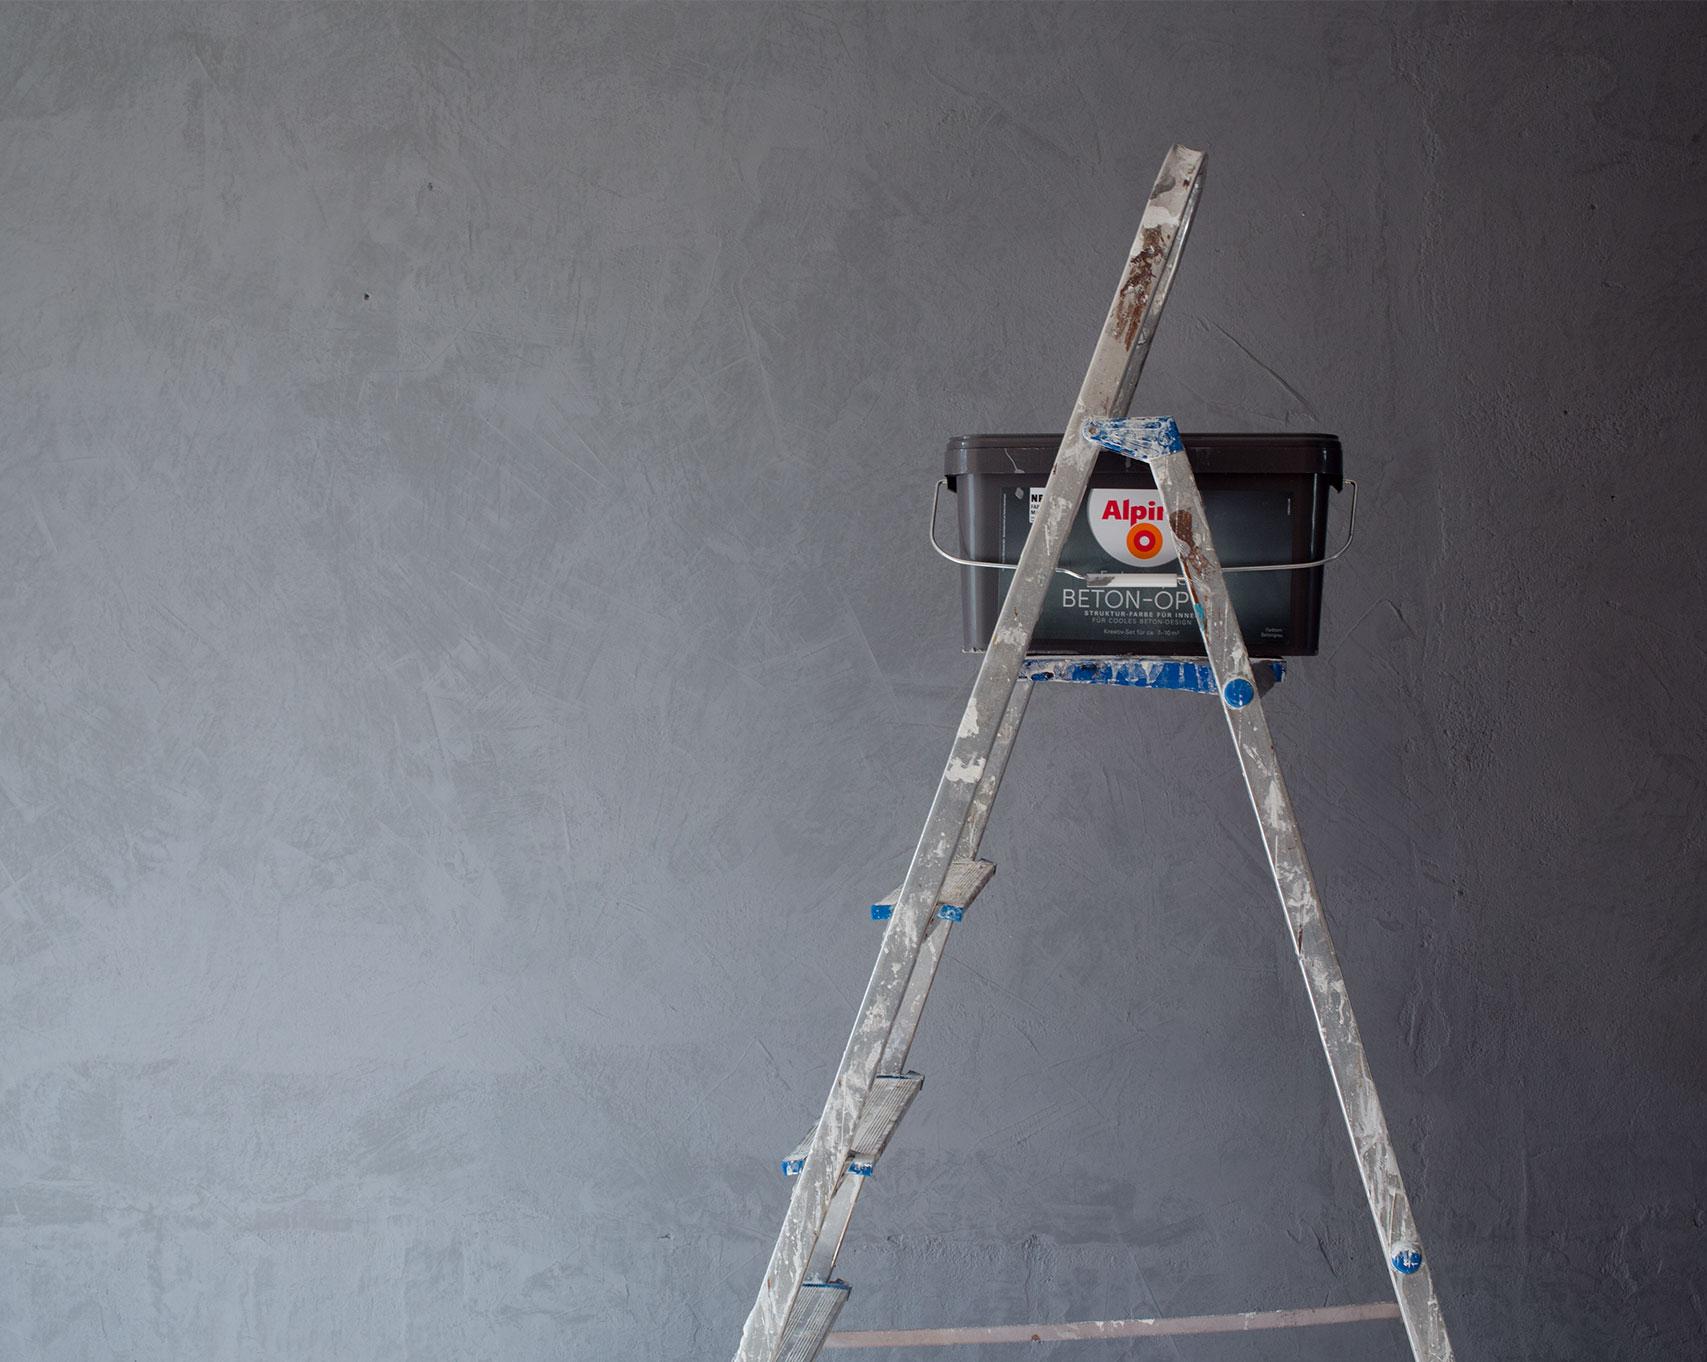 Full Size of Alpina Betonoptik Set Beton Optik Grau Bauhaus Hellgrau Toom Interiordesign Diy Eine Wand In The Coco Question Bad Hotel Hofgastein Küche Wohnzimmer Alpina Betonoptik